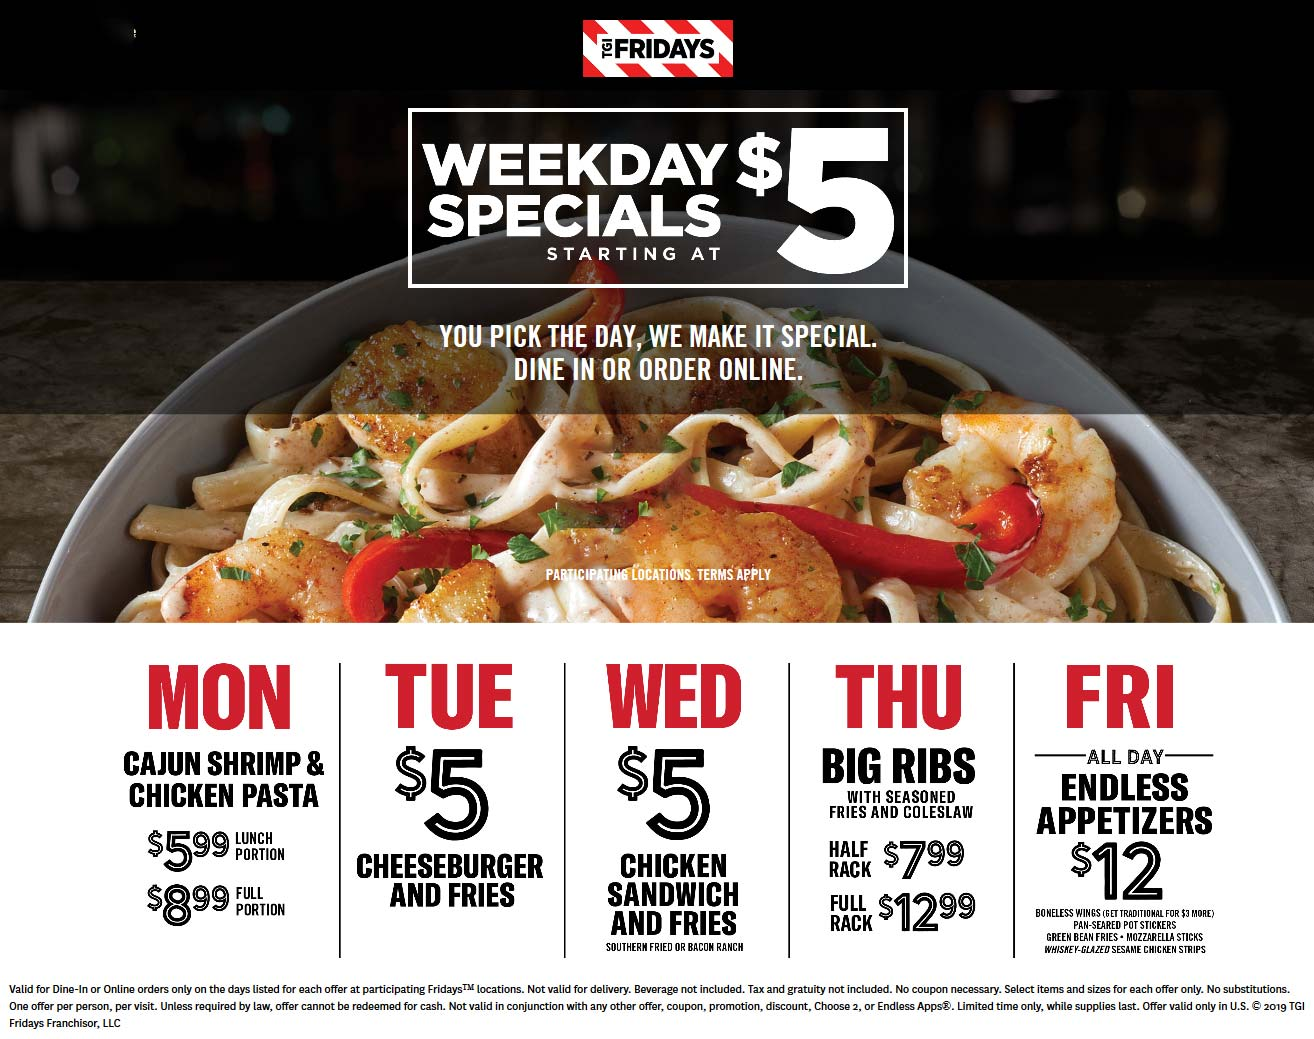 TGI Fridays Coupon January 2020 $5 cheeseburger + fries, chicken sandwich & more weekdays at TGI Fridays